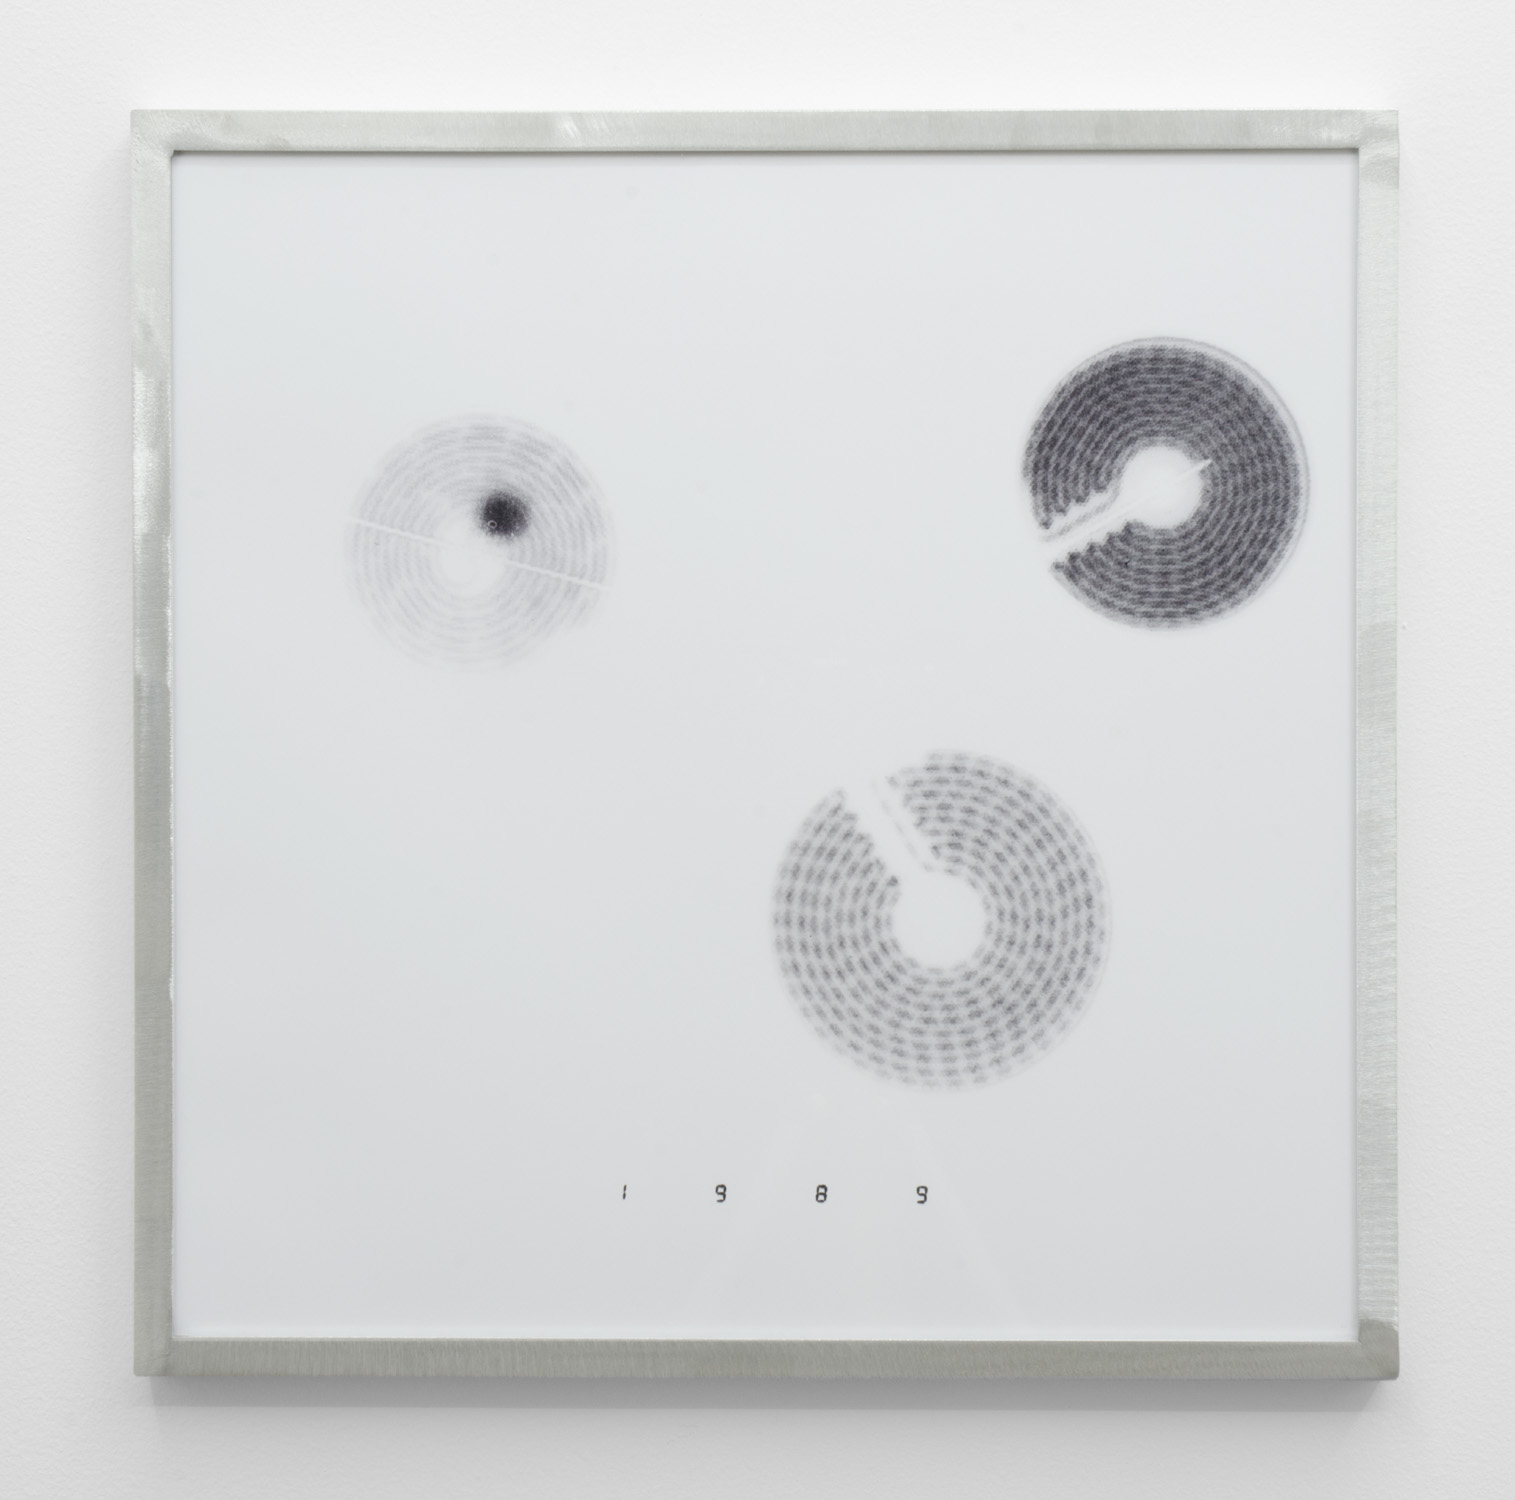 IR-3 , 2014, giclee print on hahnemuhle photorag, custom aluminium frame 40 x 40 cm.